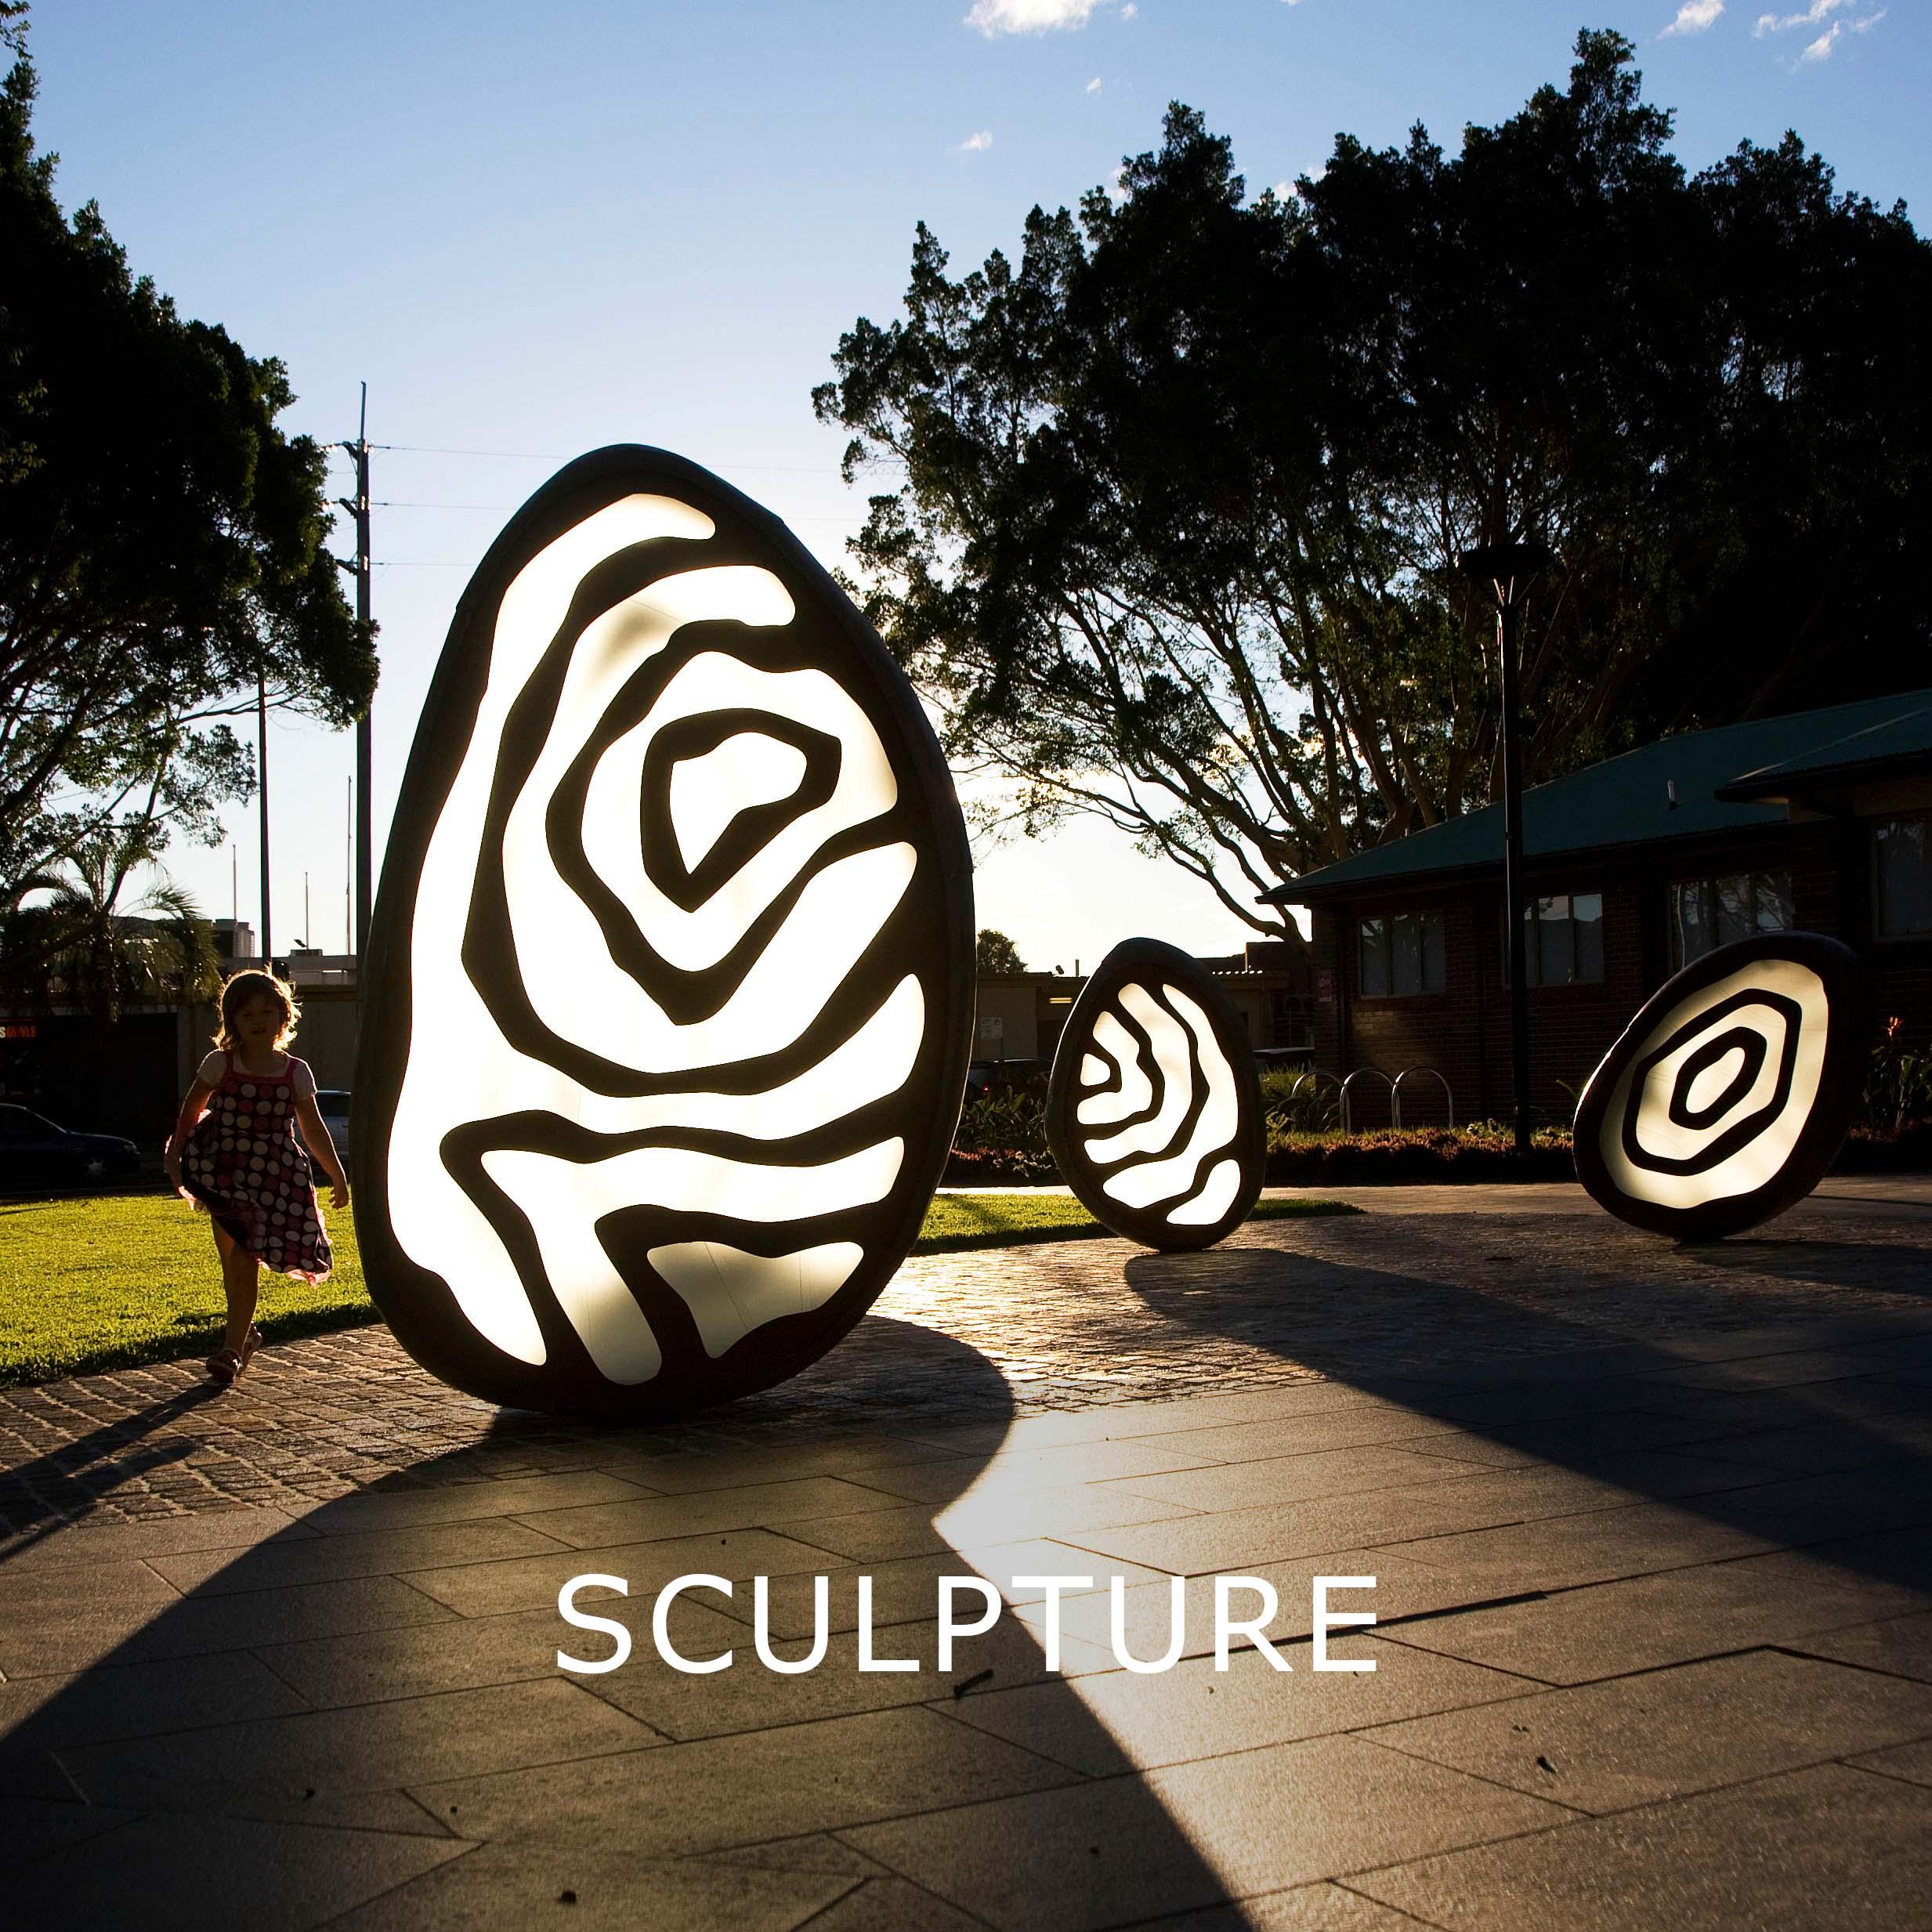 Gallery_sculpture.jpg